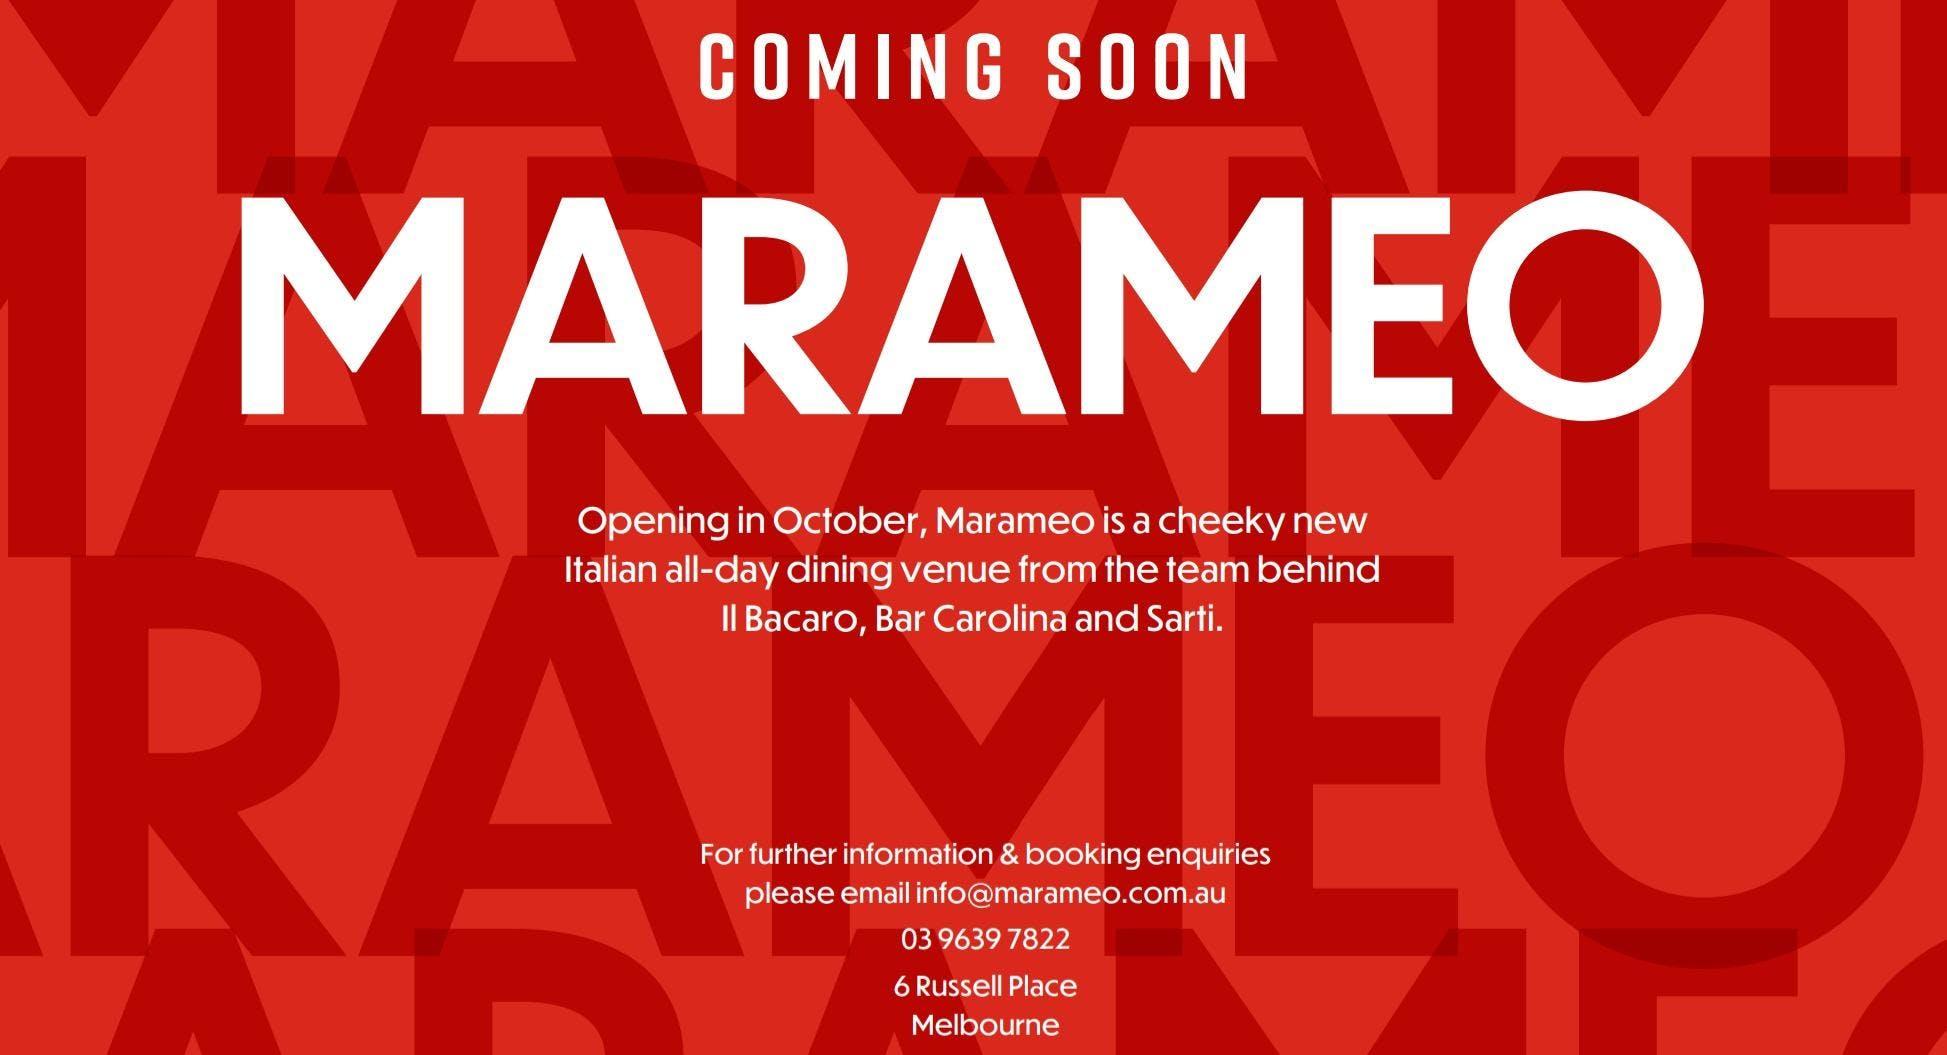 Marameo Melbourne image 1